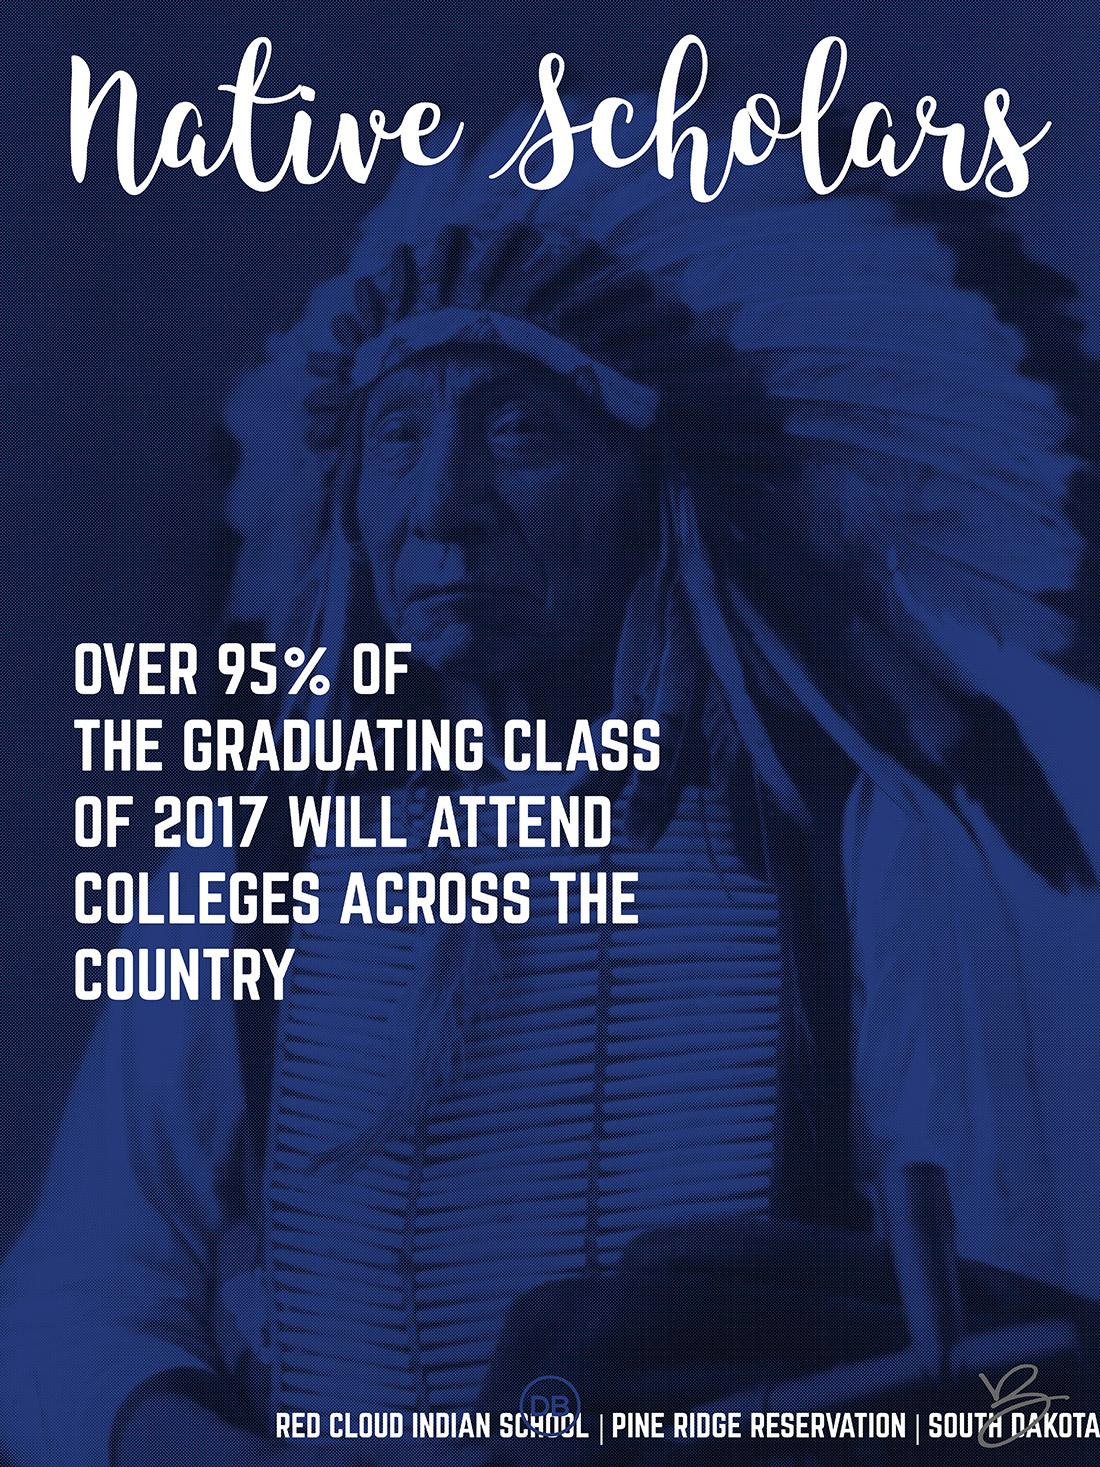 David Bernie Indian Country 52 34 Native Scholars Red Cloud Indian School